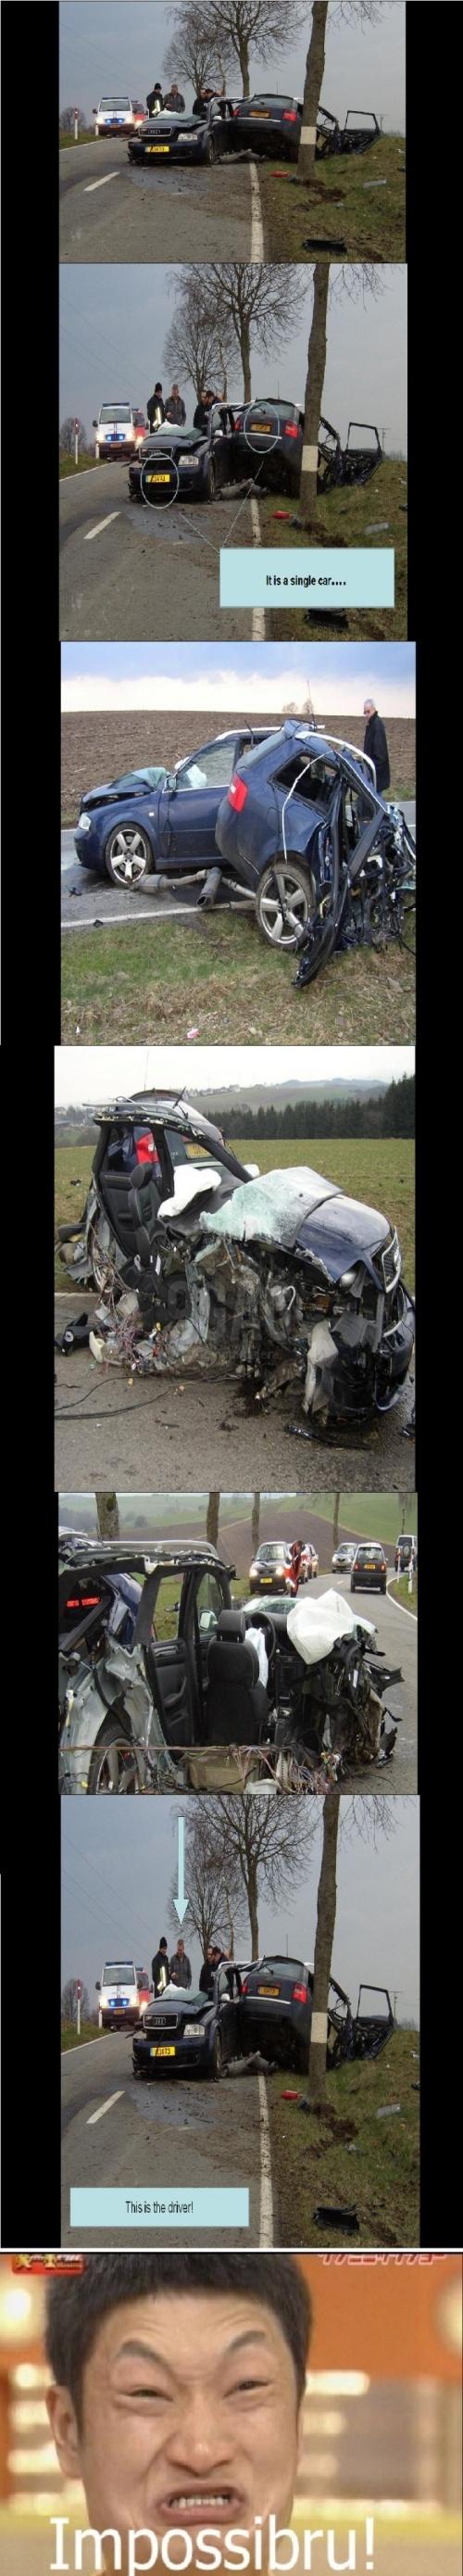 Impossibru Car Crash!